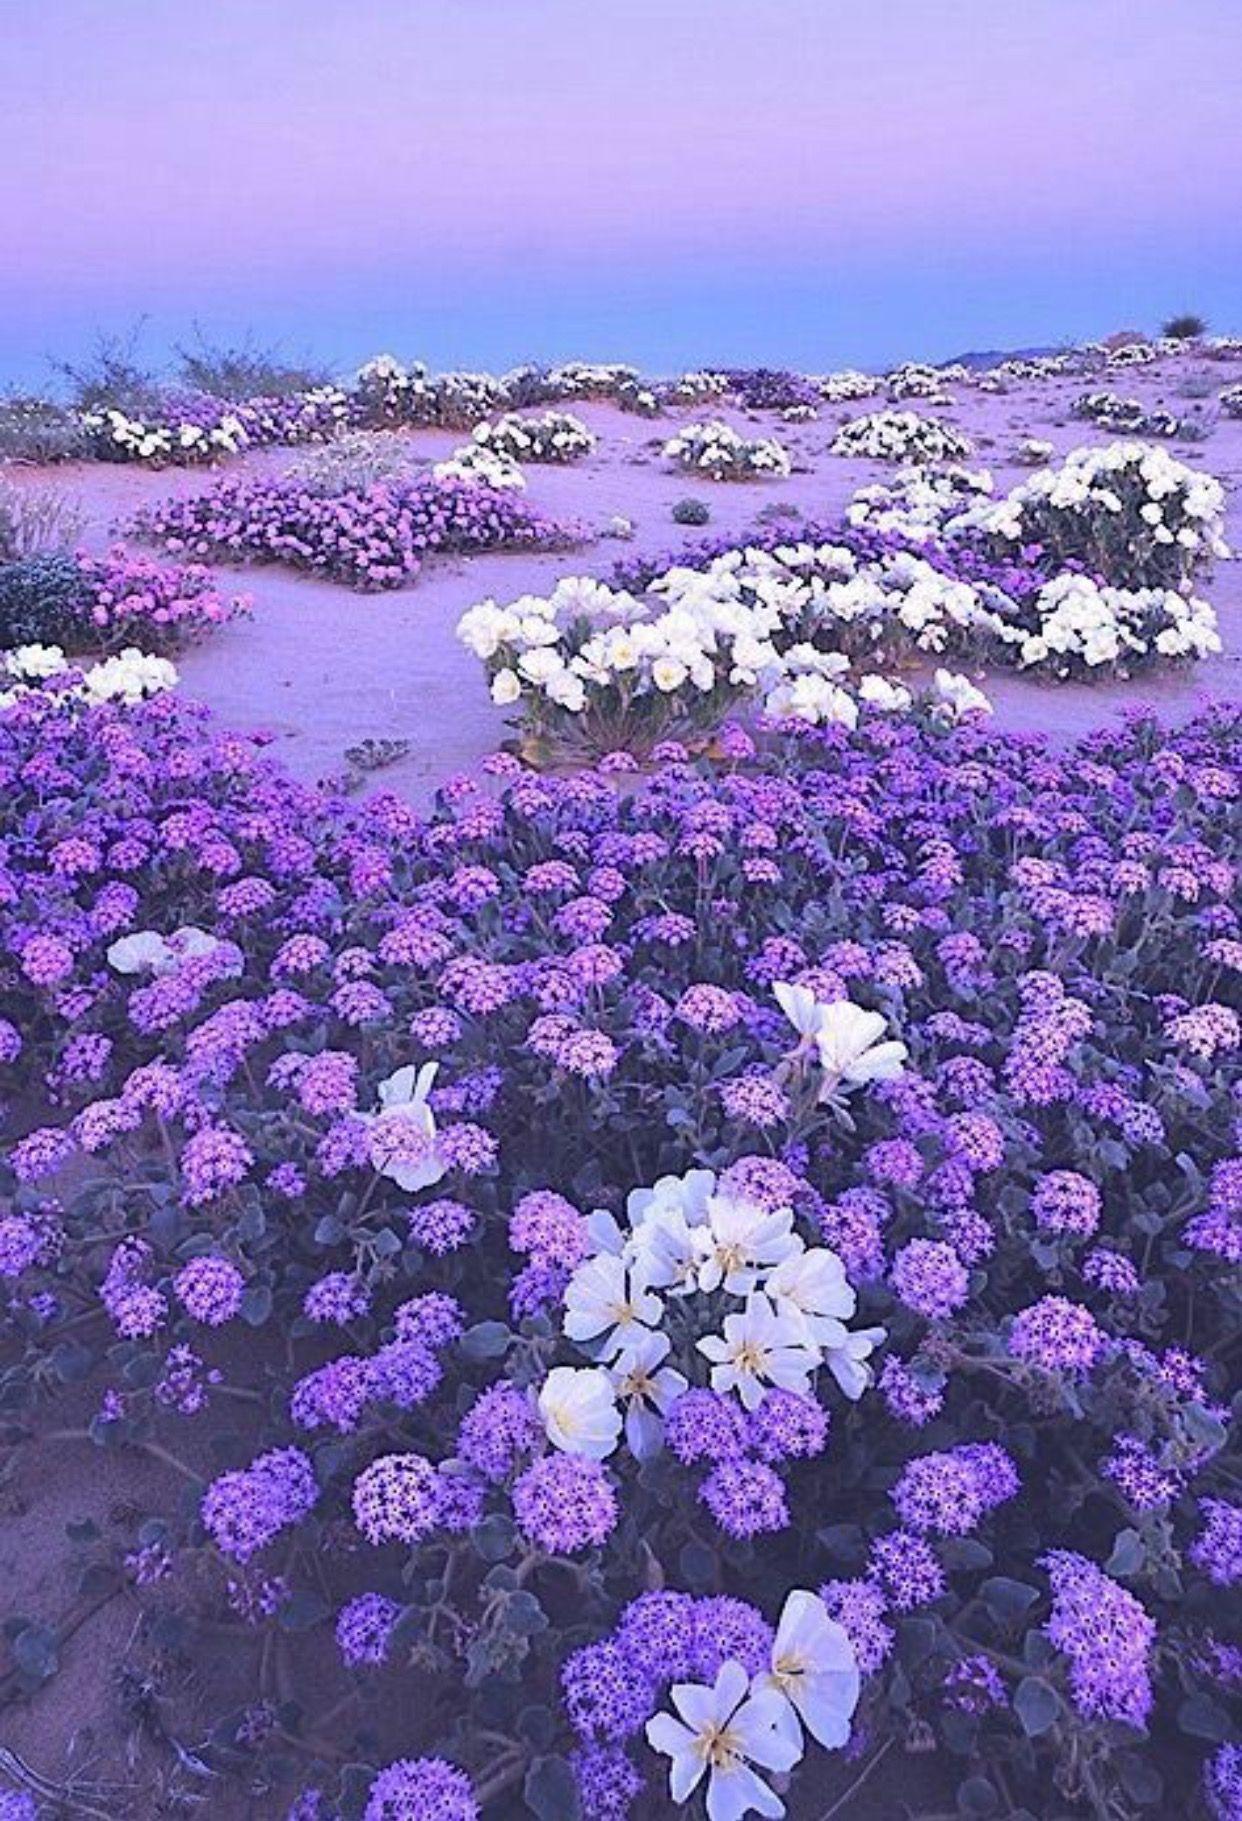 Pin By Carol Serani On Flowers Gardens Pinterest Flowers